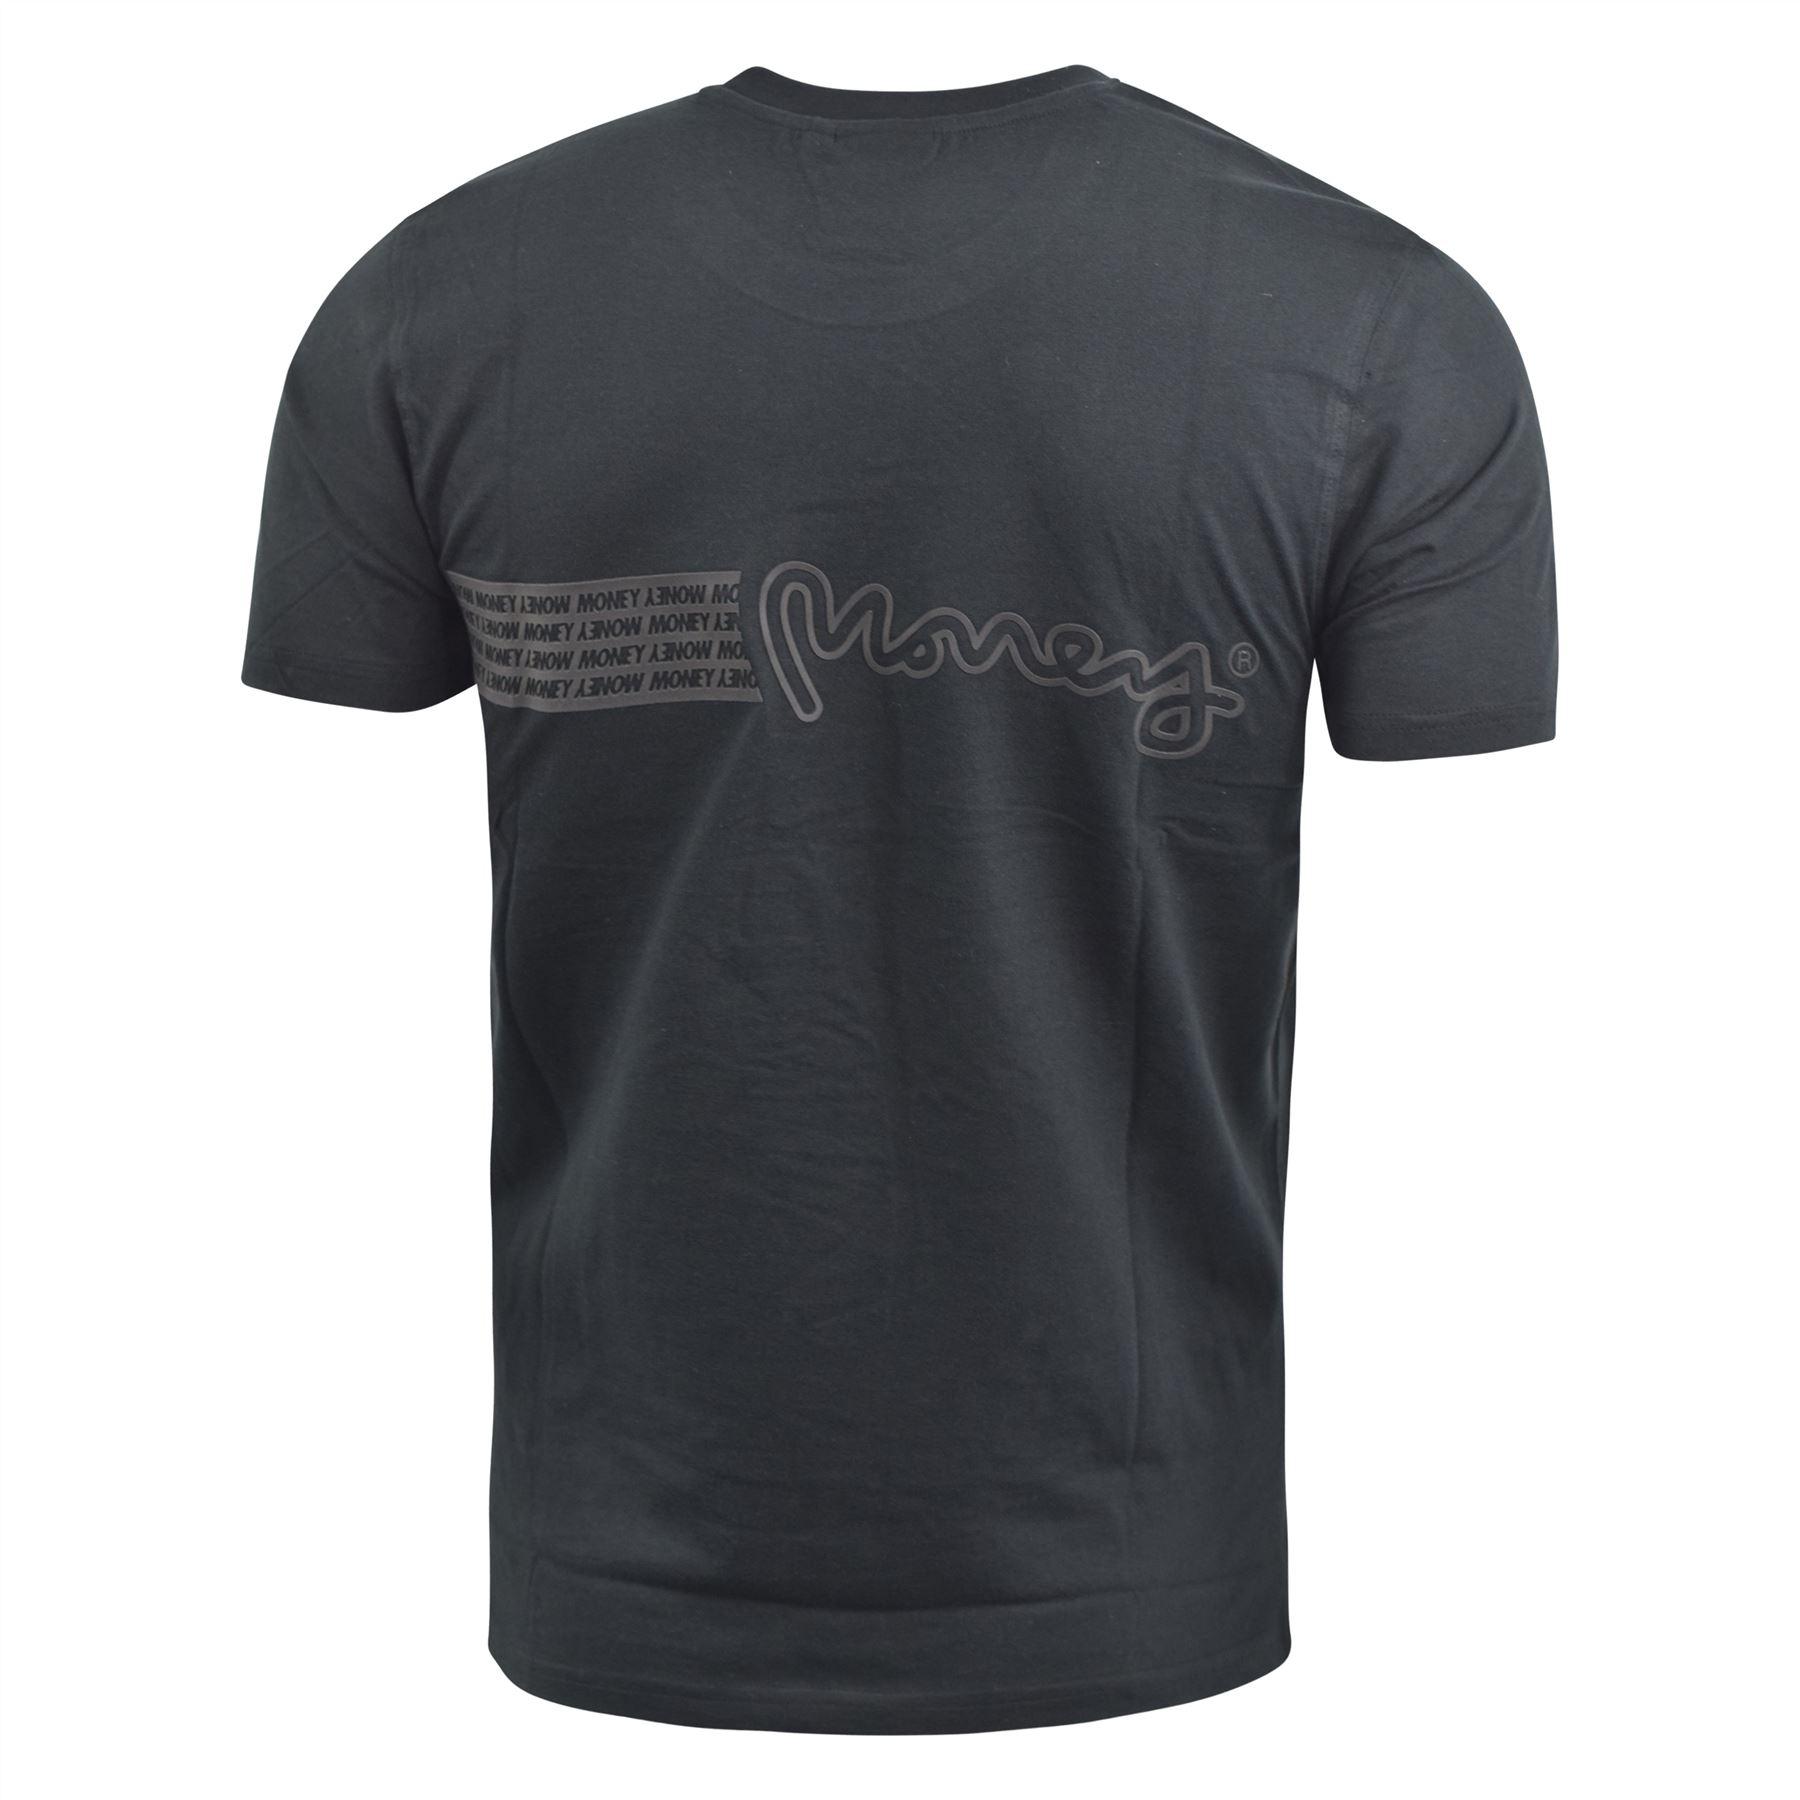 Tee Money Shirt Designers Top Street Clothing Ape Mens Ebay T qB0Exw5BY